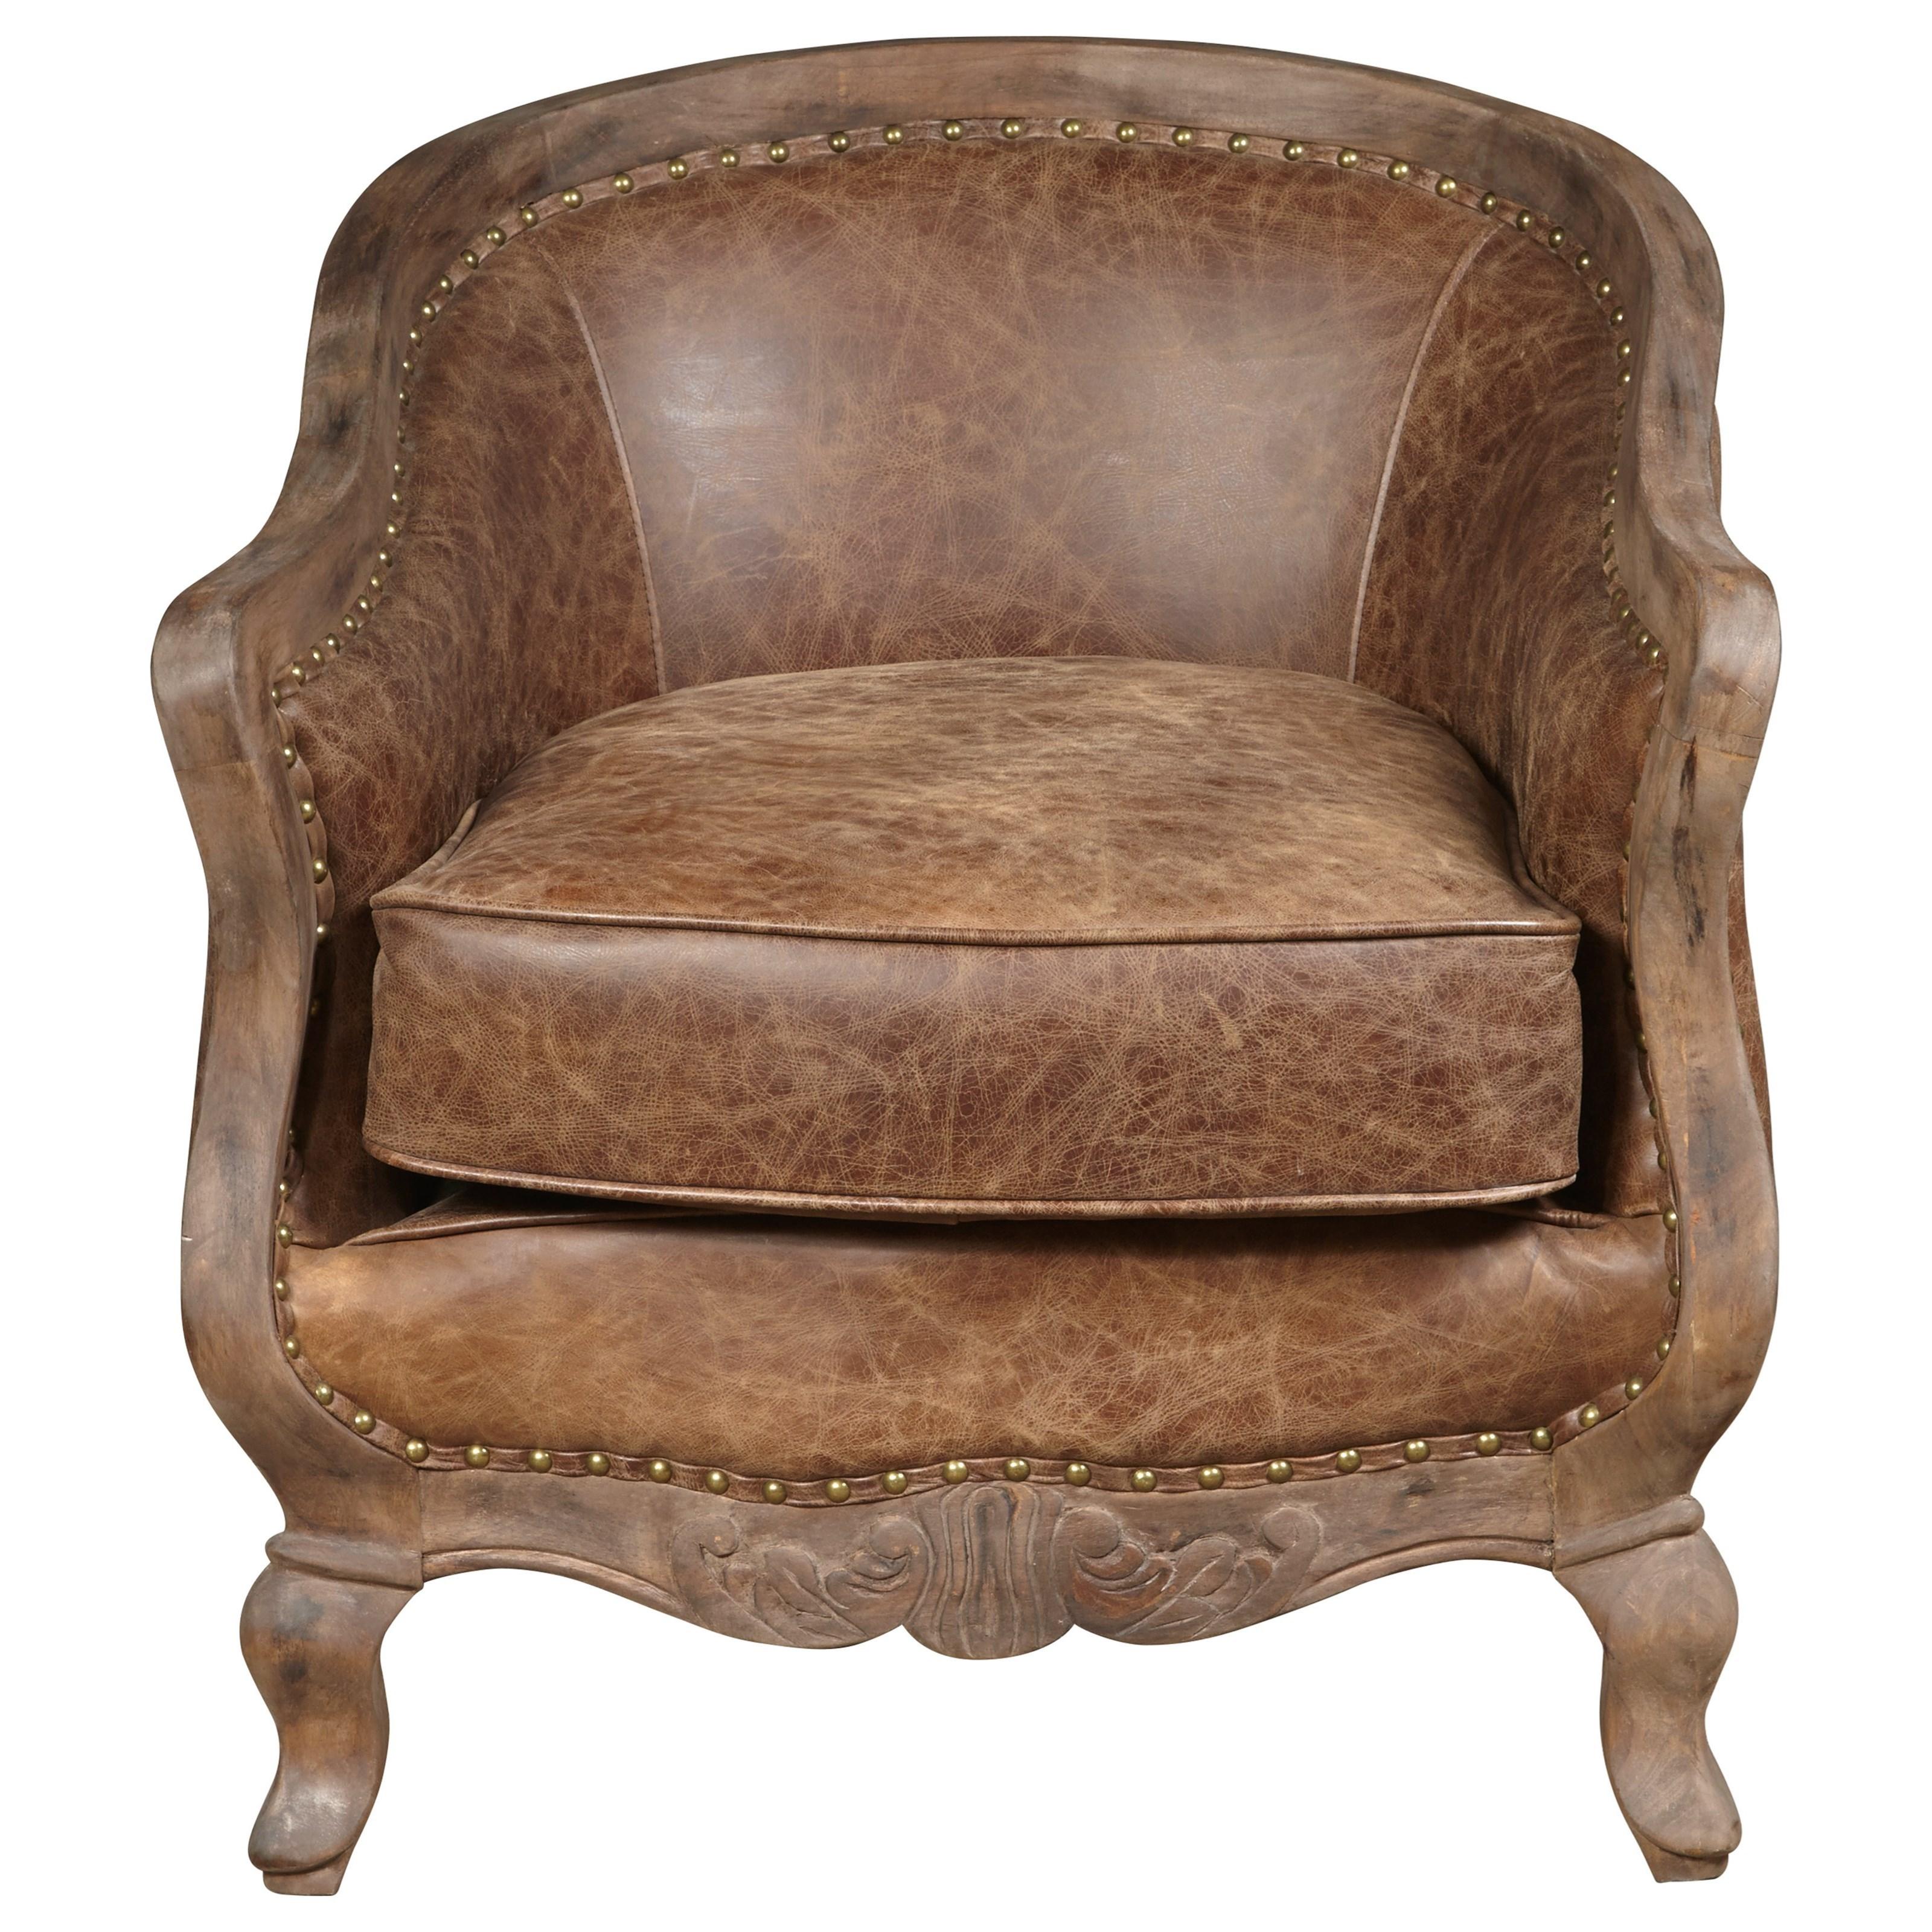 Pulaski Furniture Accent Chairs Sloane Chair ...